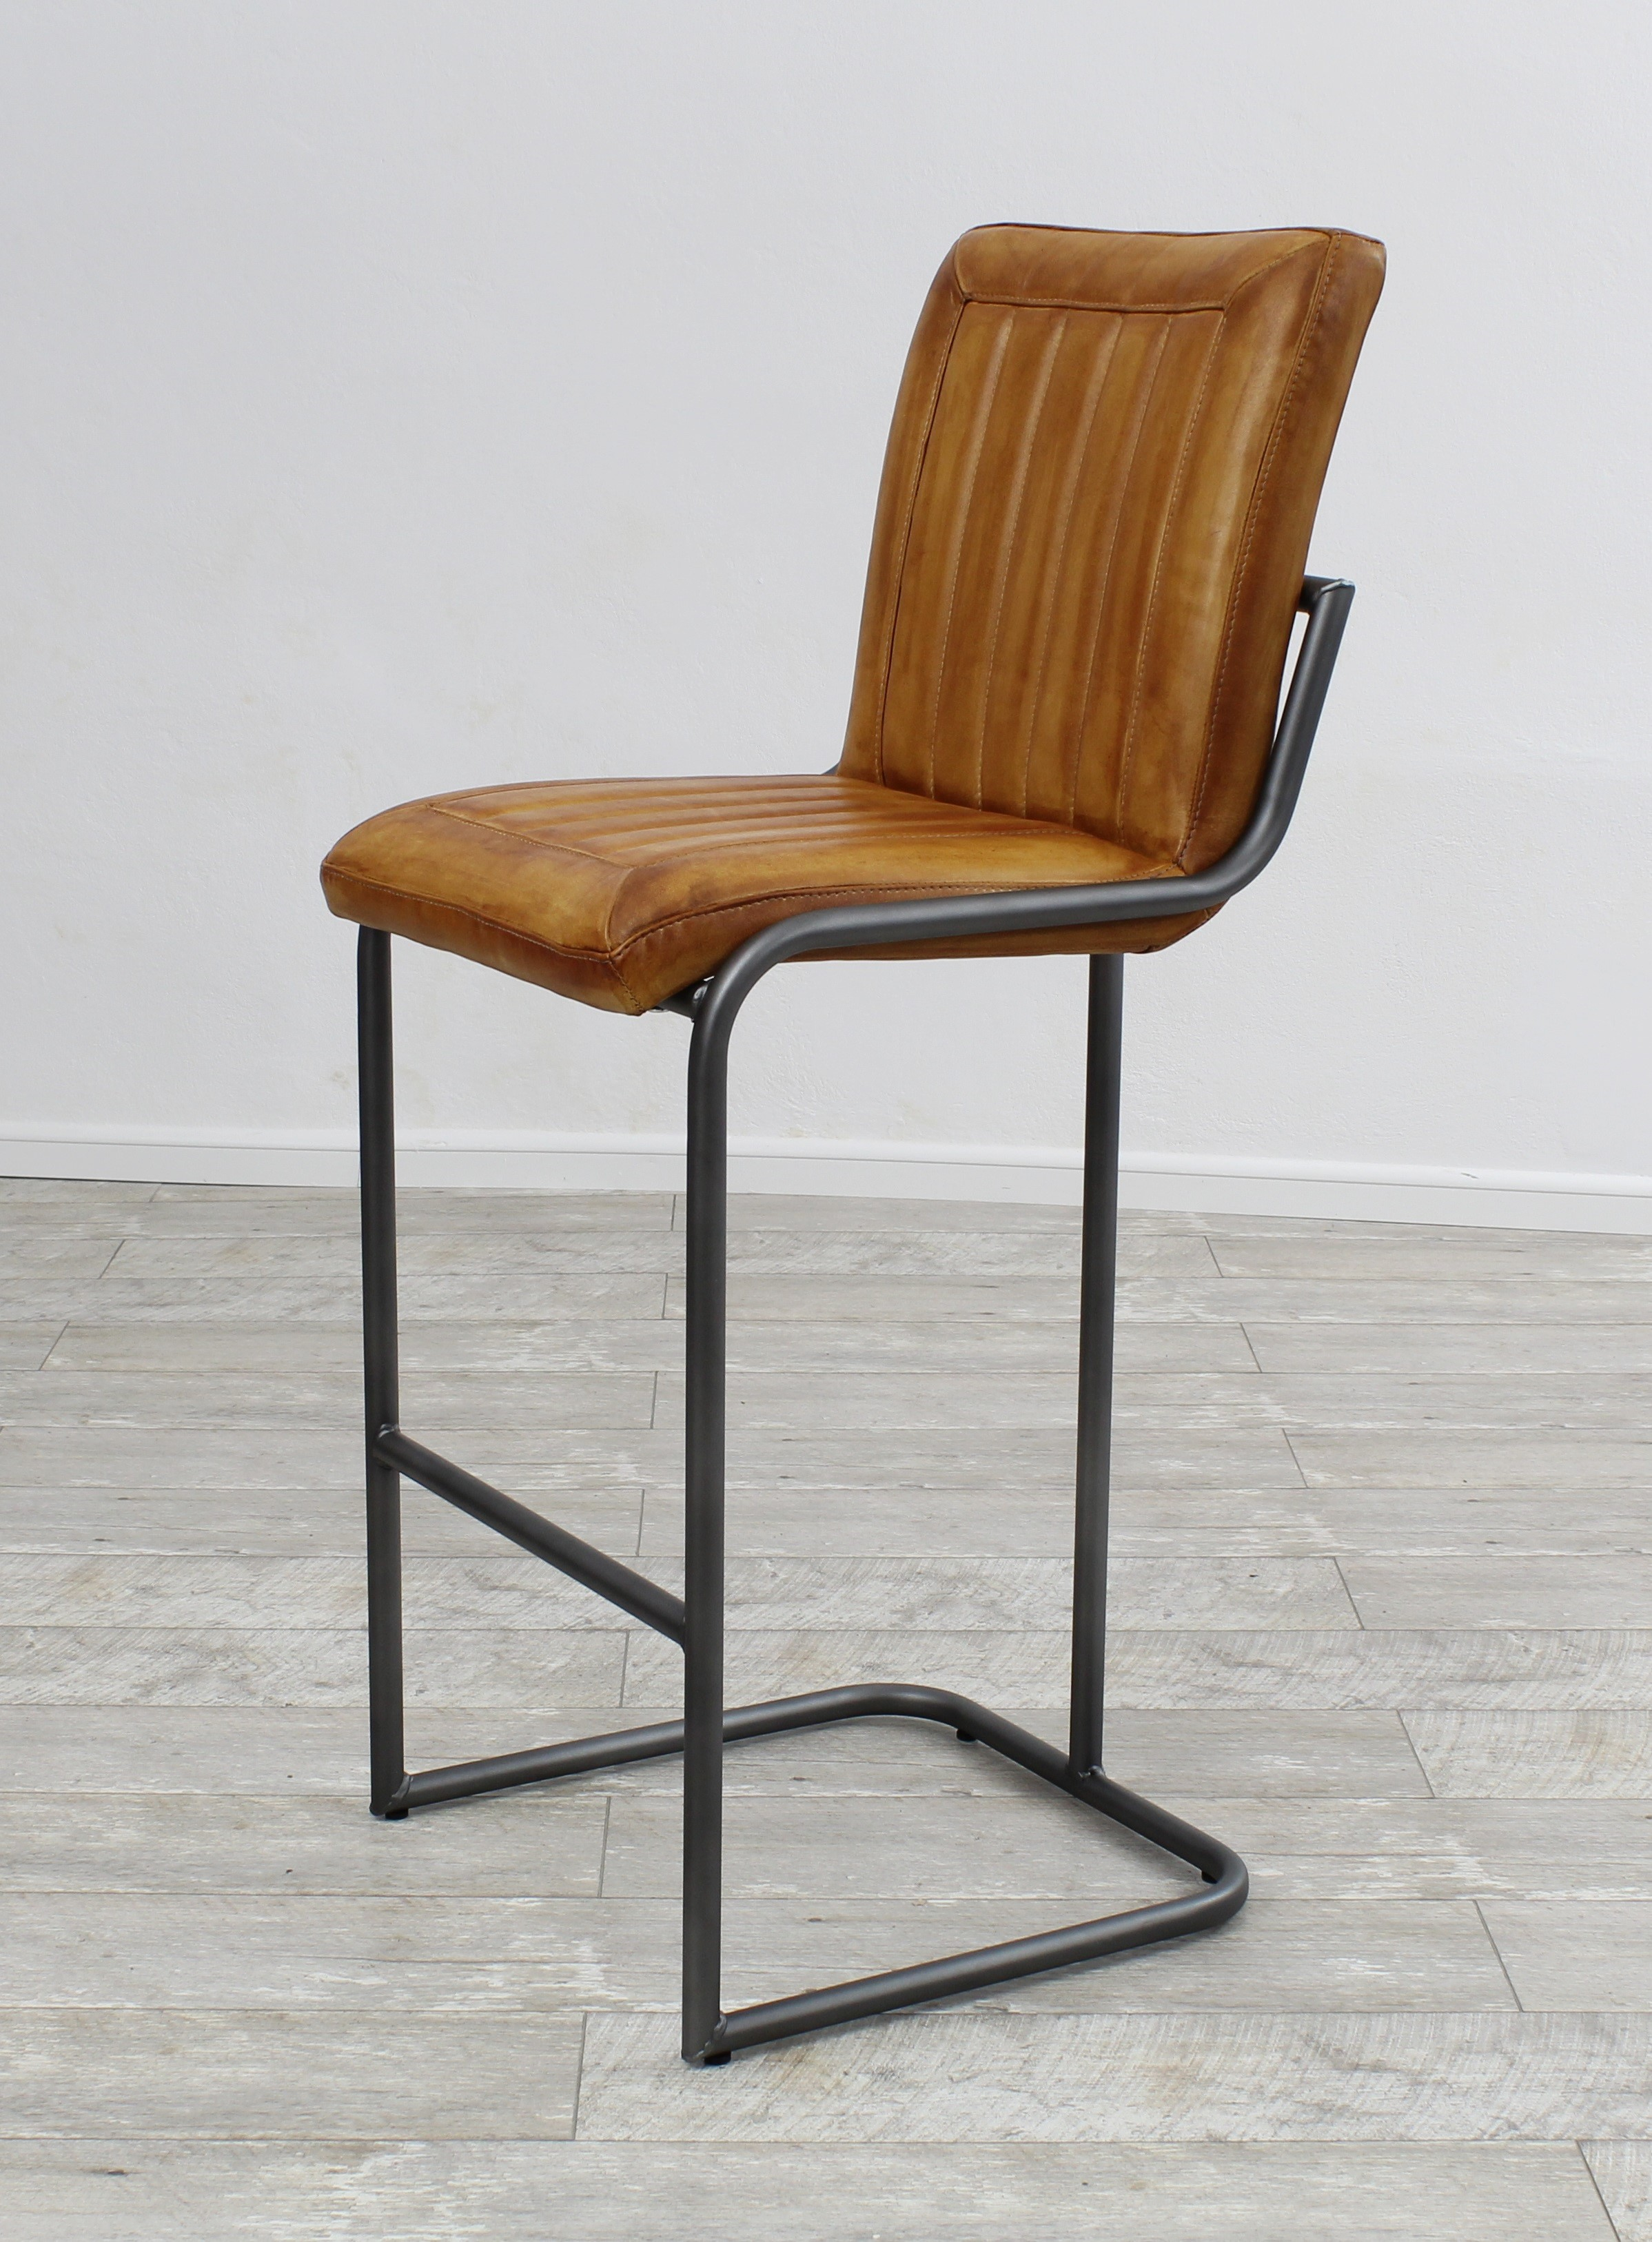 Aktiv Moebel De Barhocker Metall Fuss Designer Berlin 11 Echt Leder Vintage Industrielook Buffelleder